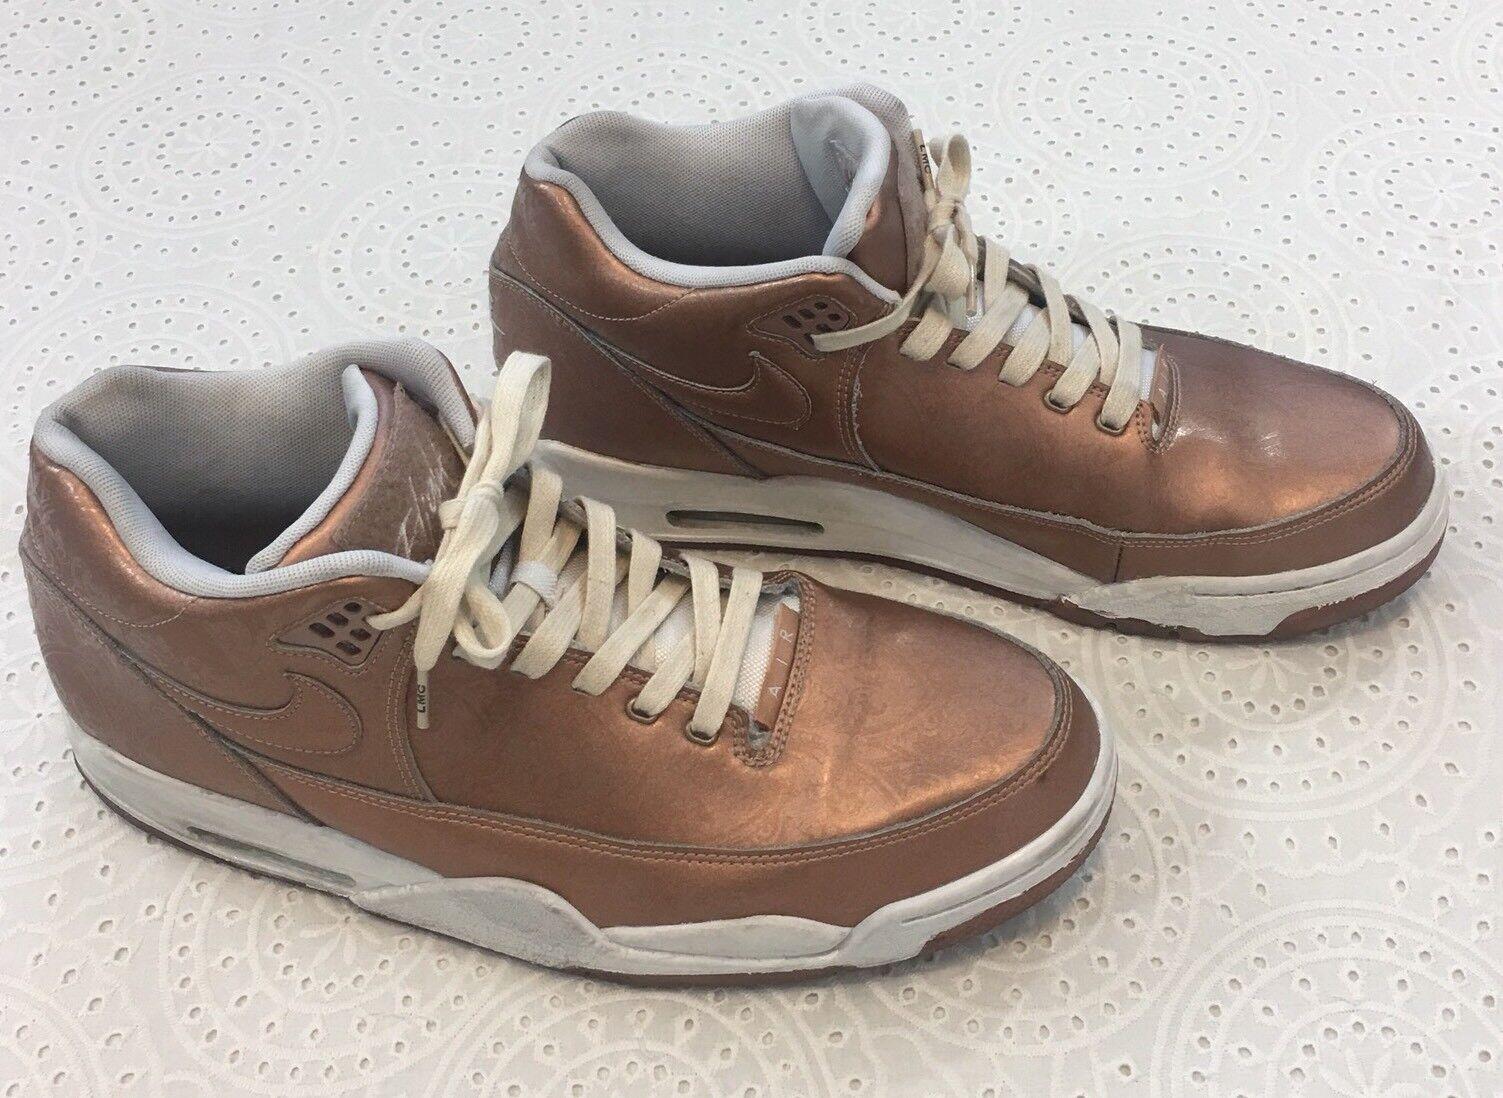 Nike Flight Squad, Flight 89 Design, Metallic Red Bronze Athletic shoes Size 12